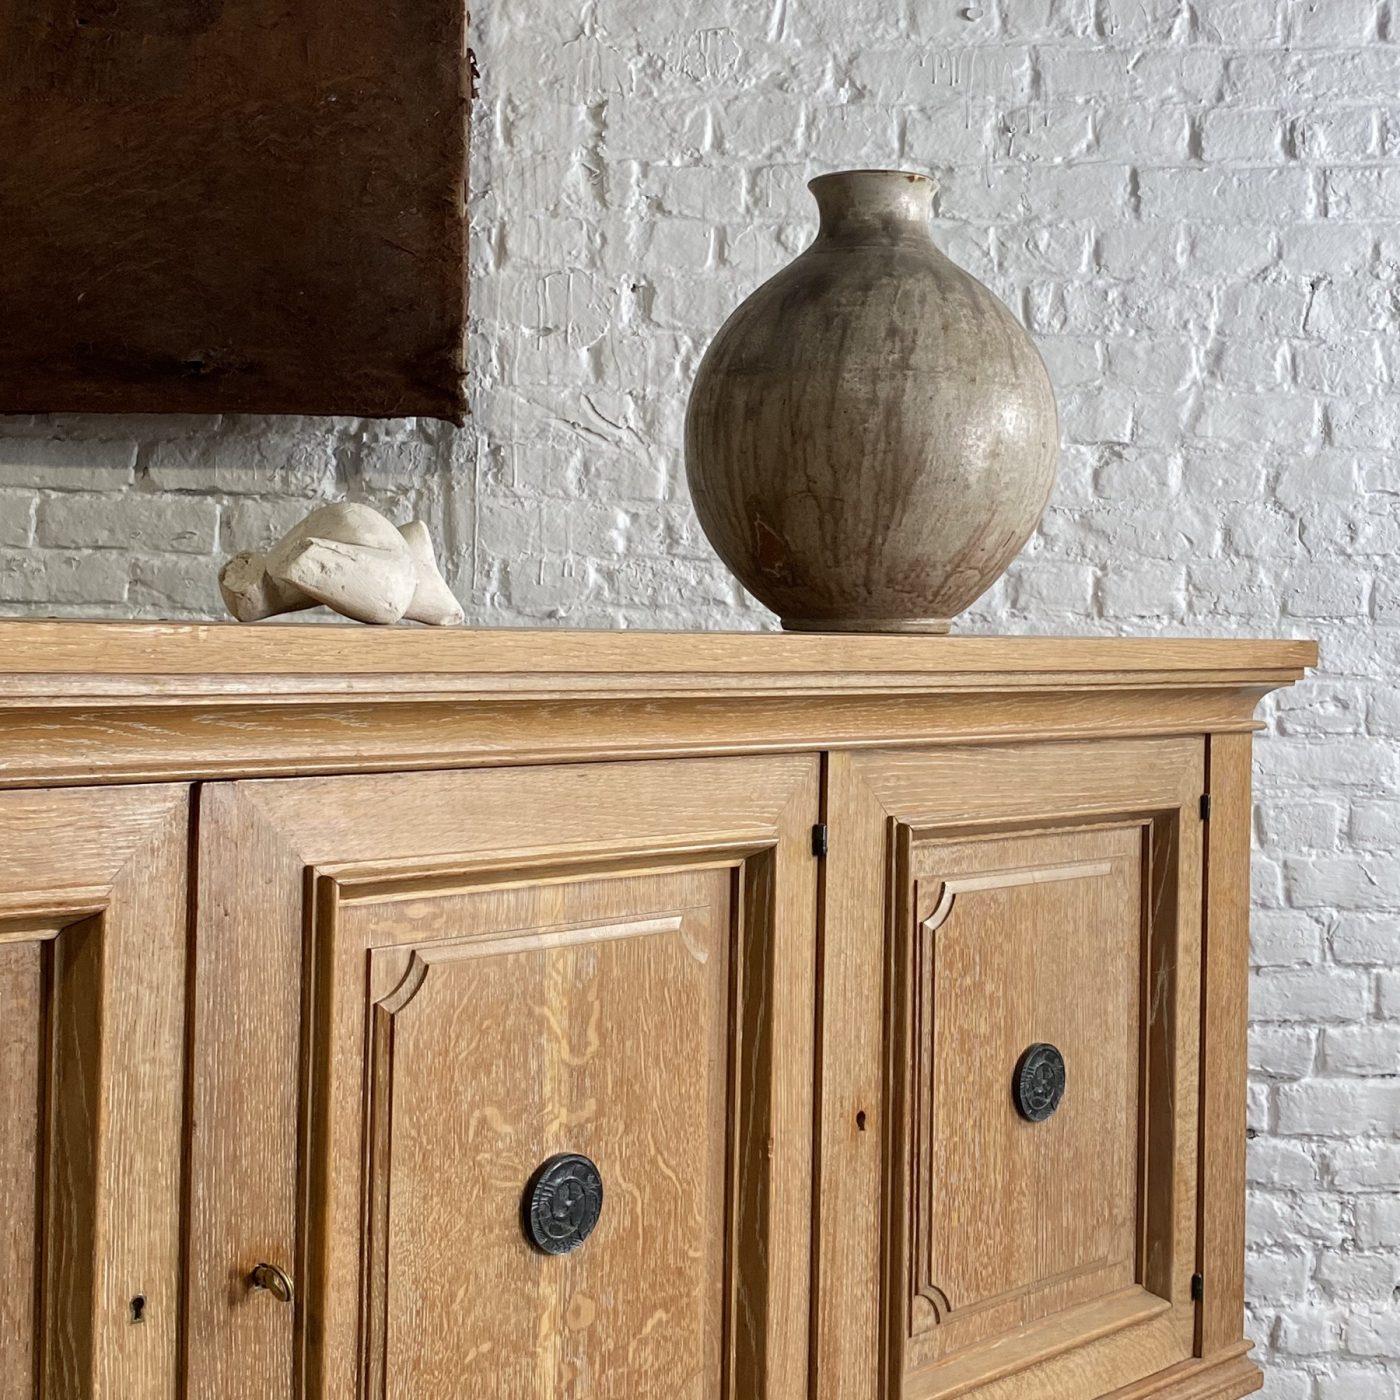 objet-vagabond-oak-sideboard0006